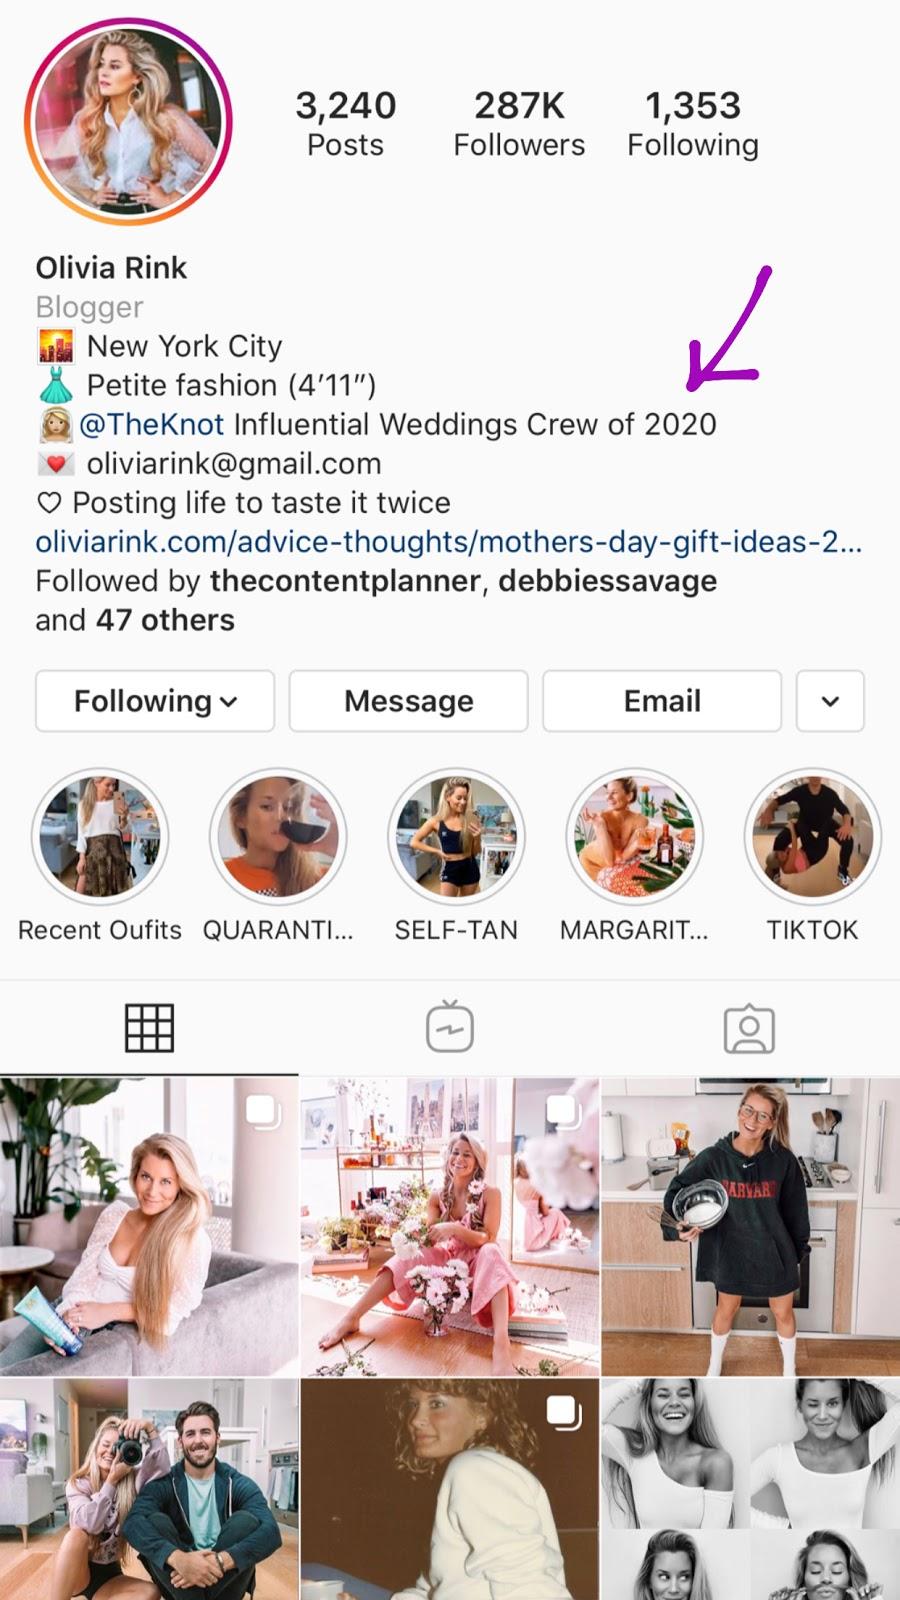 olivia rink instagram bio accolade optimize your instagram bio